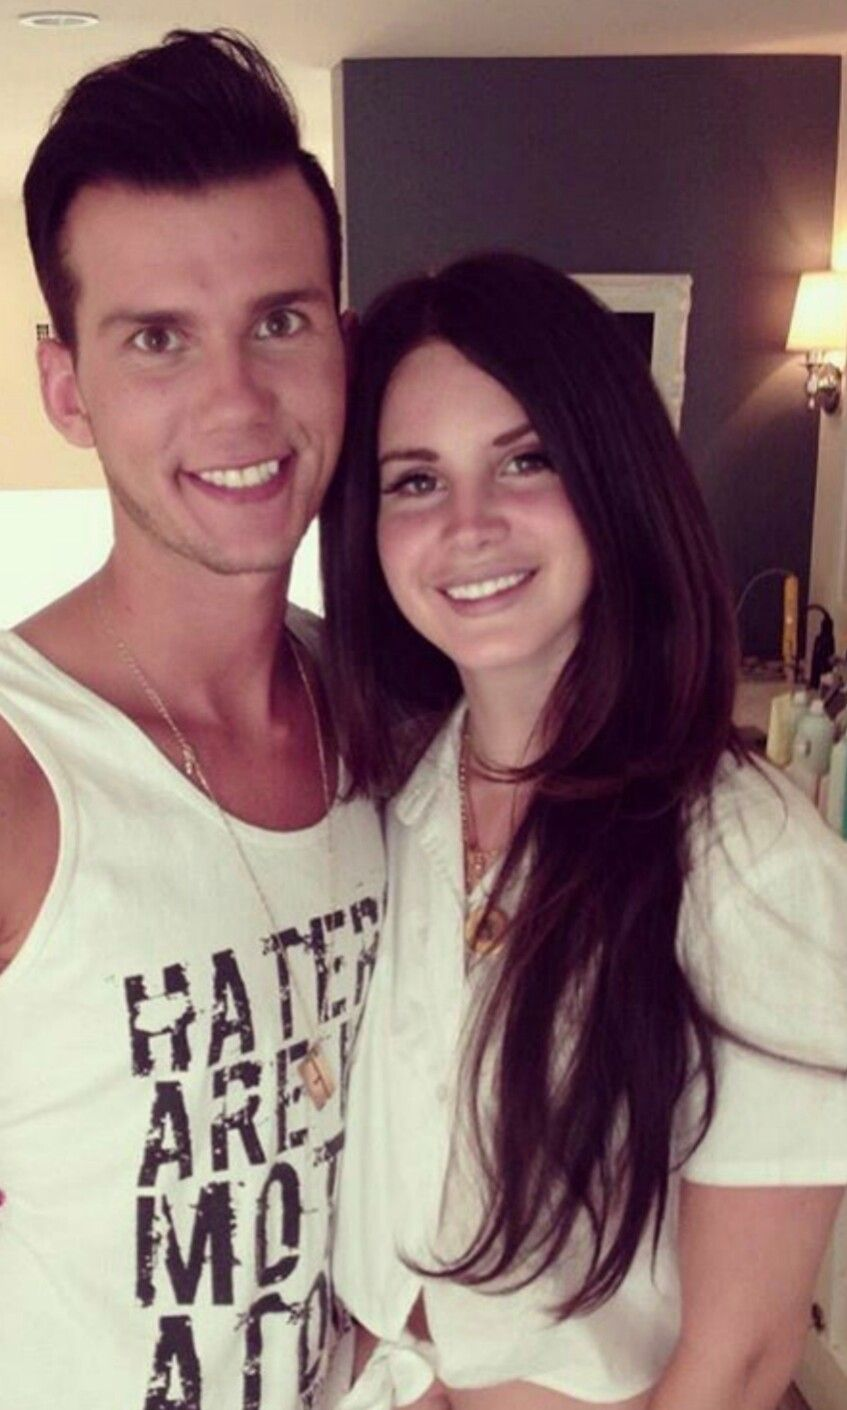 Lana Del Rey and a fan #LDR